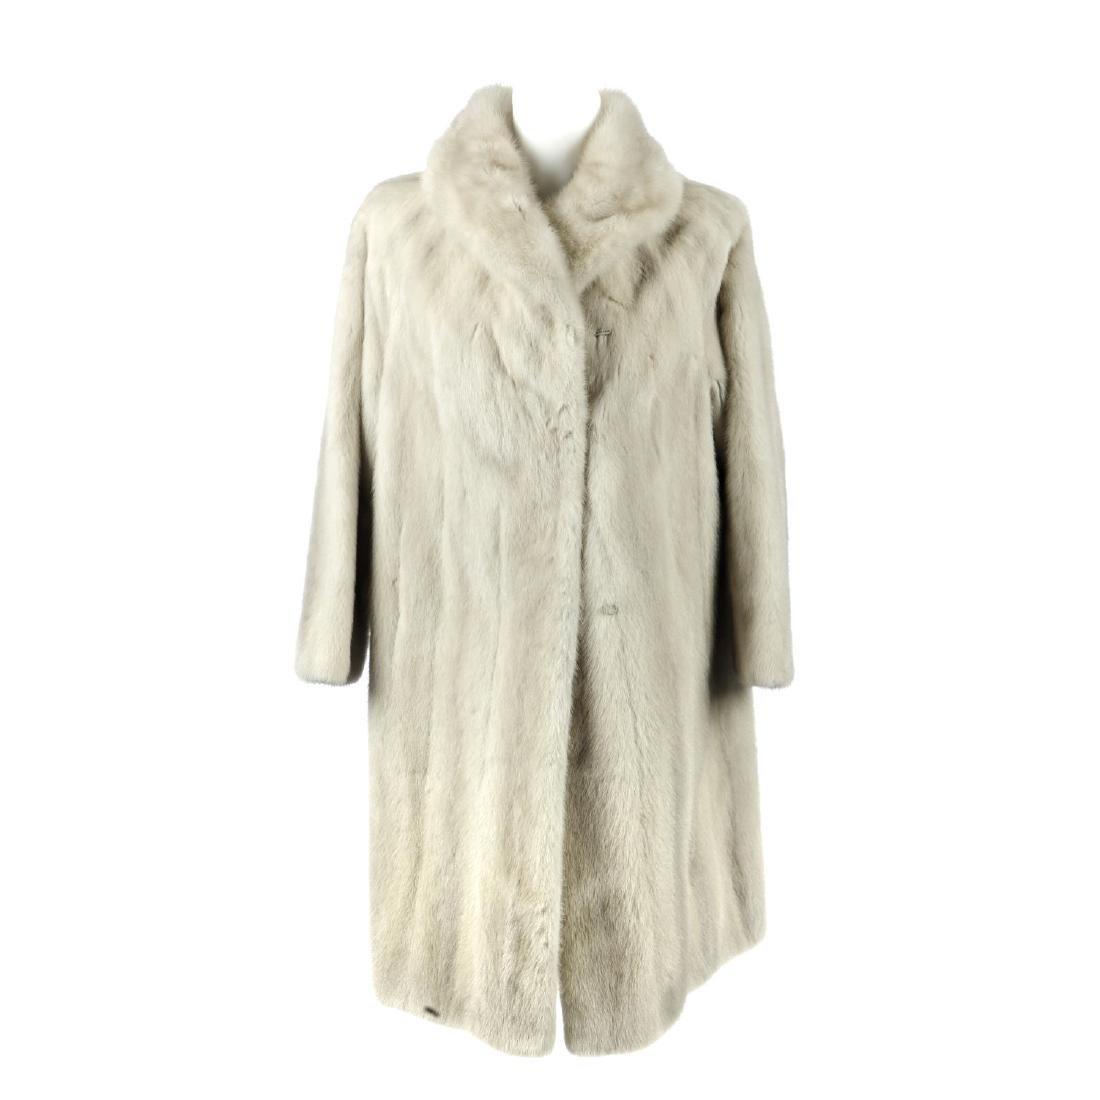 An azurene mink full-length coat. Featuring a shawl